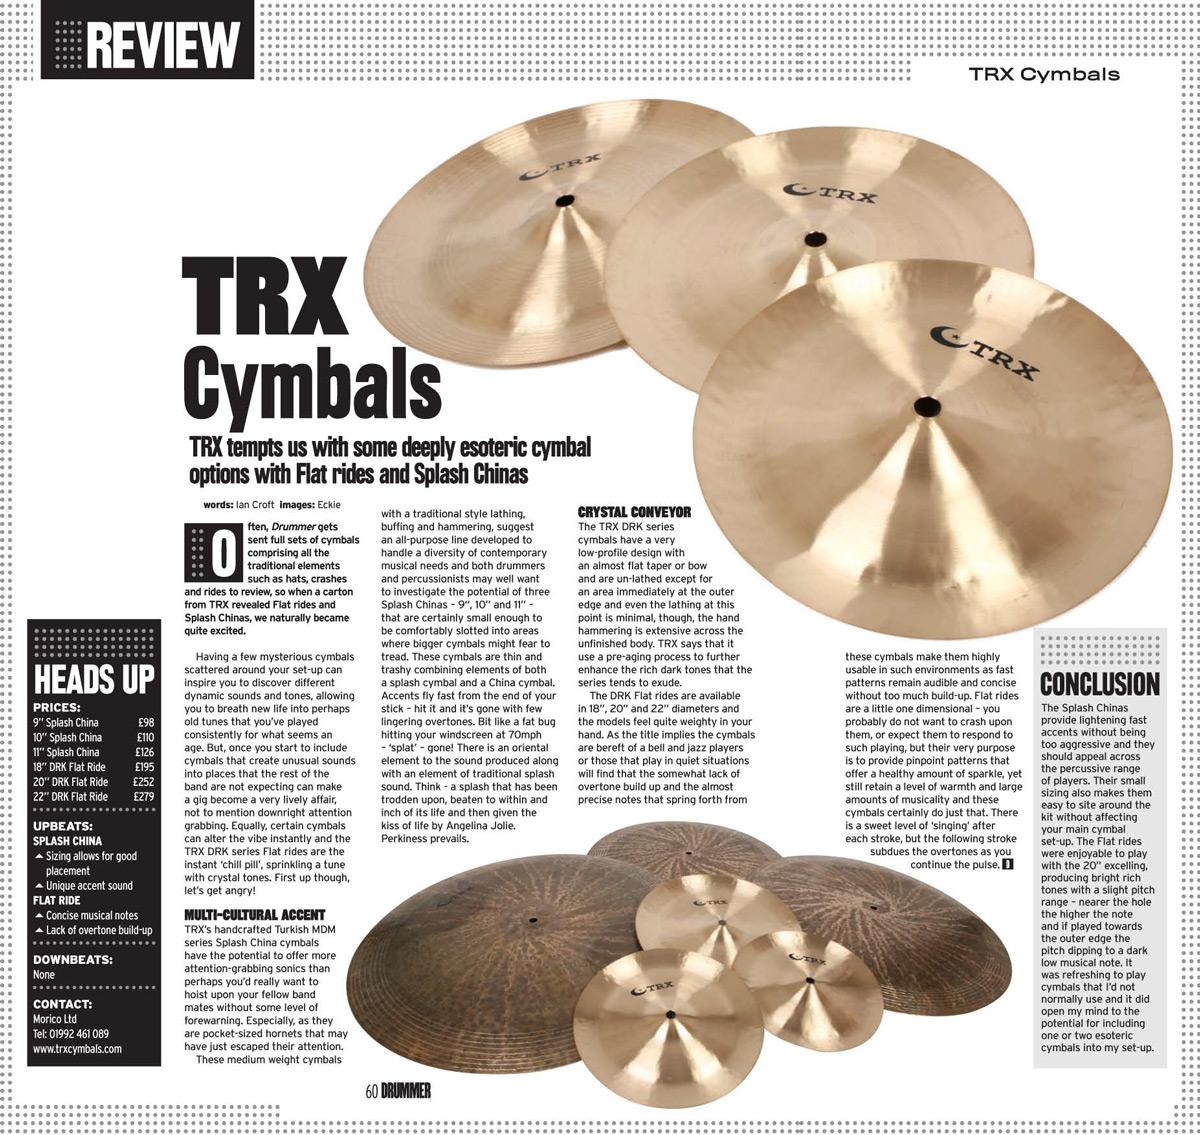 TRX Specials Review In Drummer Magazine